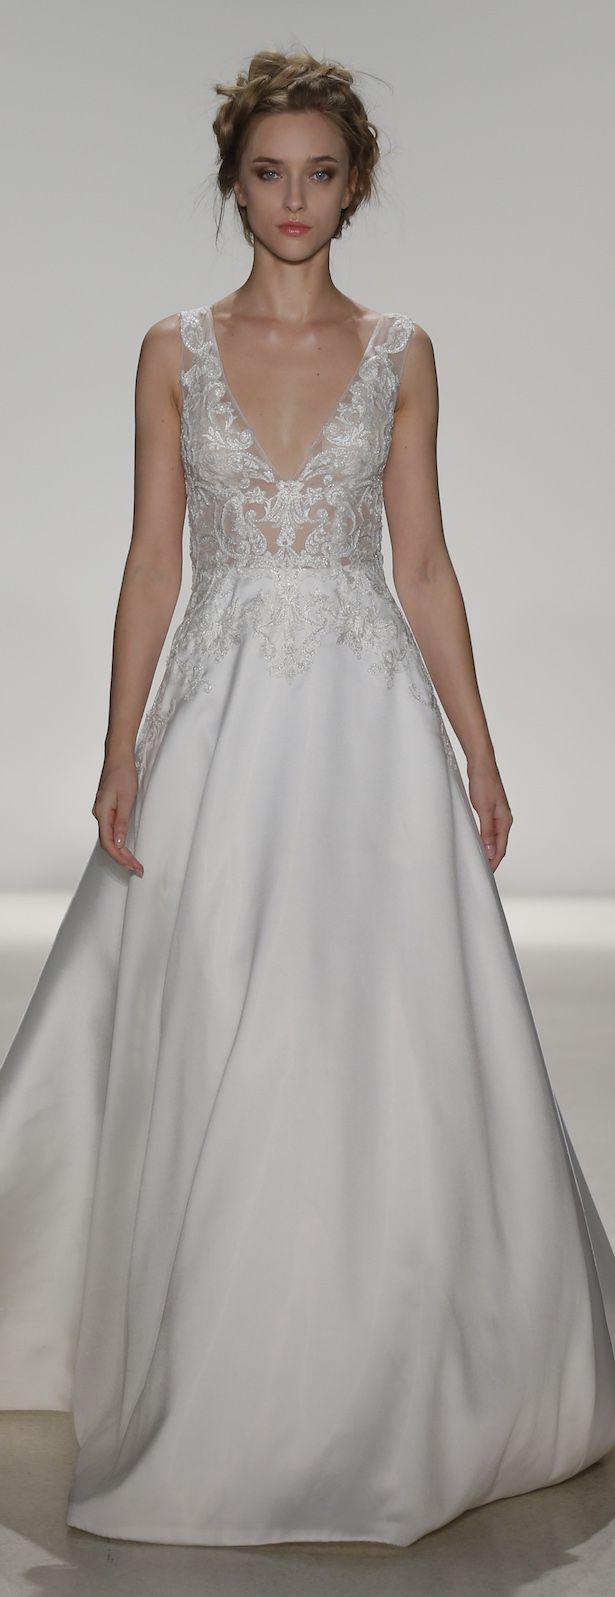 Wedding Dress by Kelly Faetanini Spring 2018 - CERES